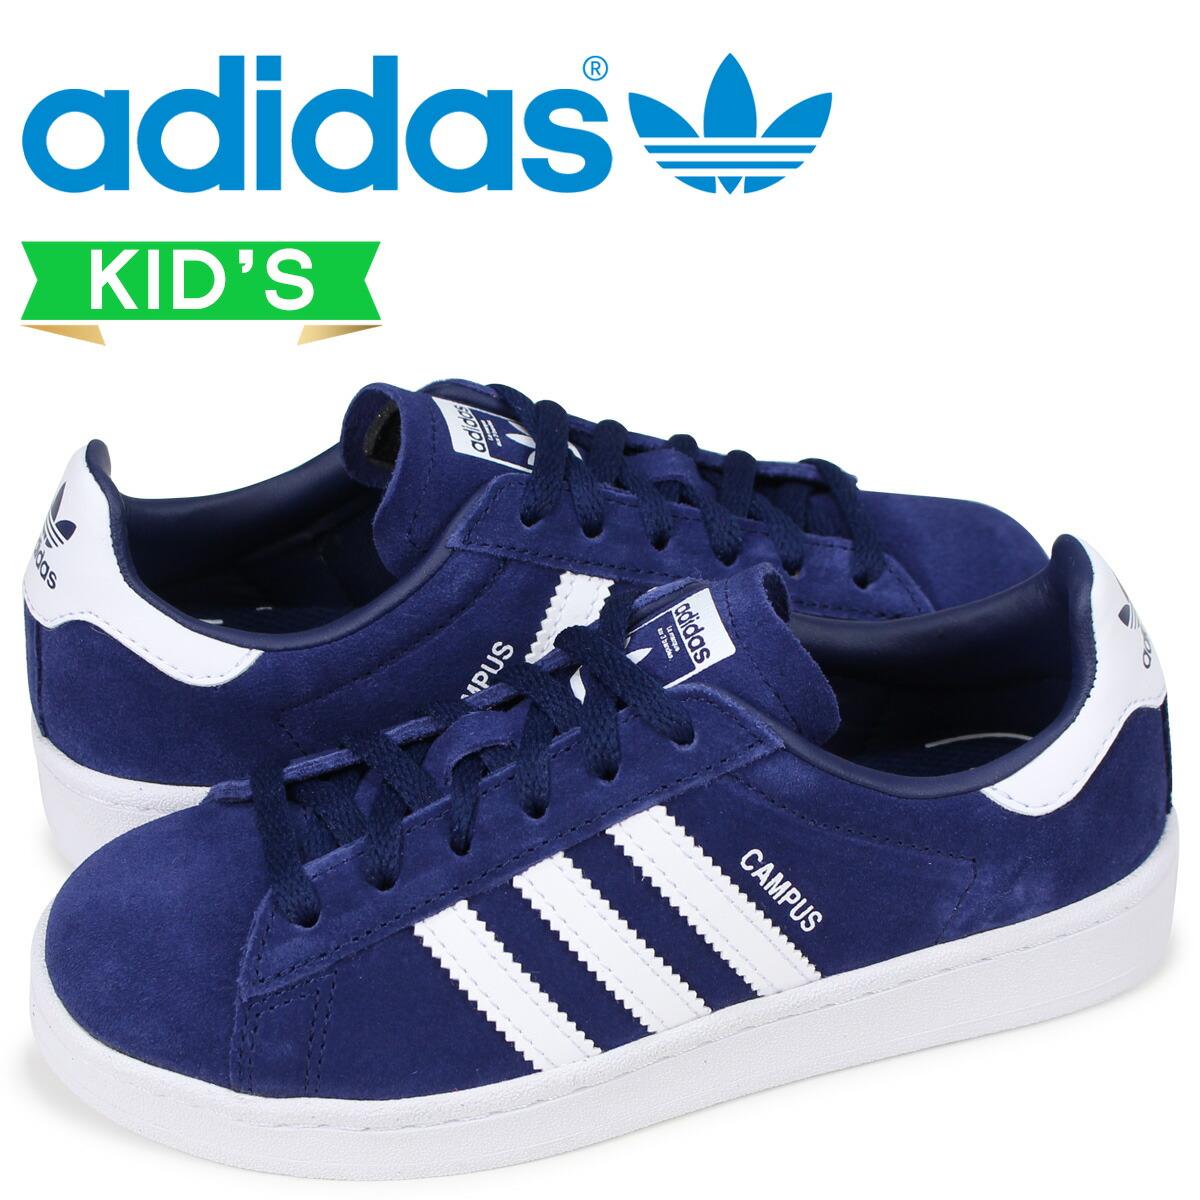 8d1399ed2dbe9 Adidas Original Scan Originals Pass Online Kids Sneak Shop Sqw7tv